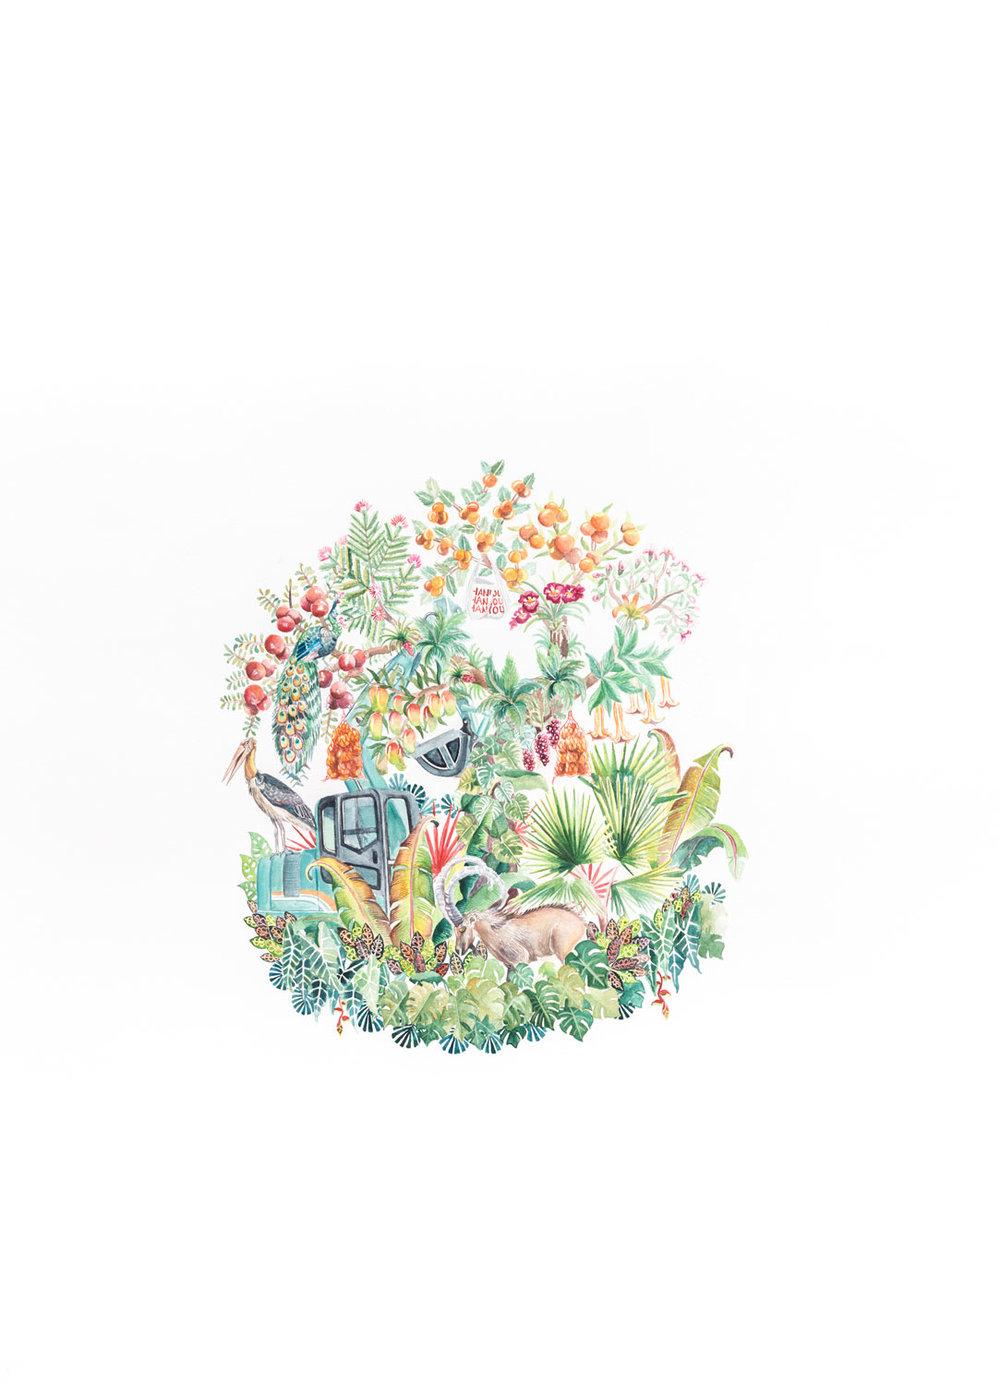 Robin-Crofut-Brittingham-Human-Artifact-5-(Excavator)-Watercolour-on-paper-2018-30-in-x-22-in.jpg